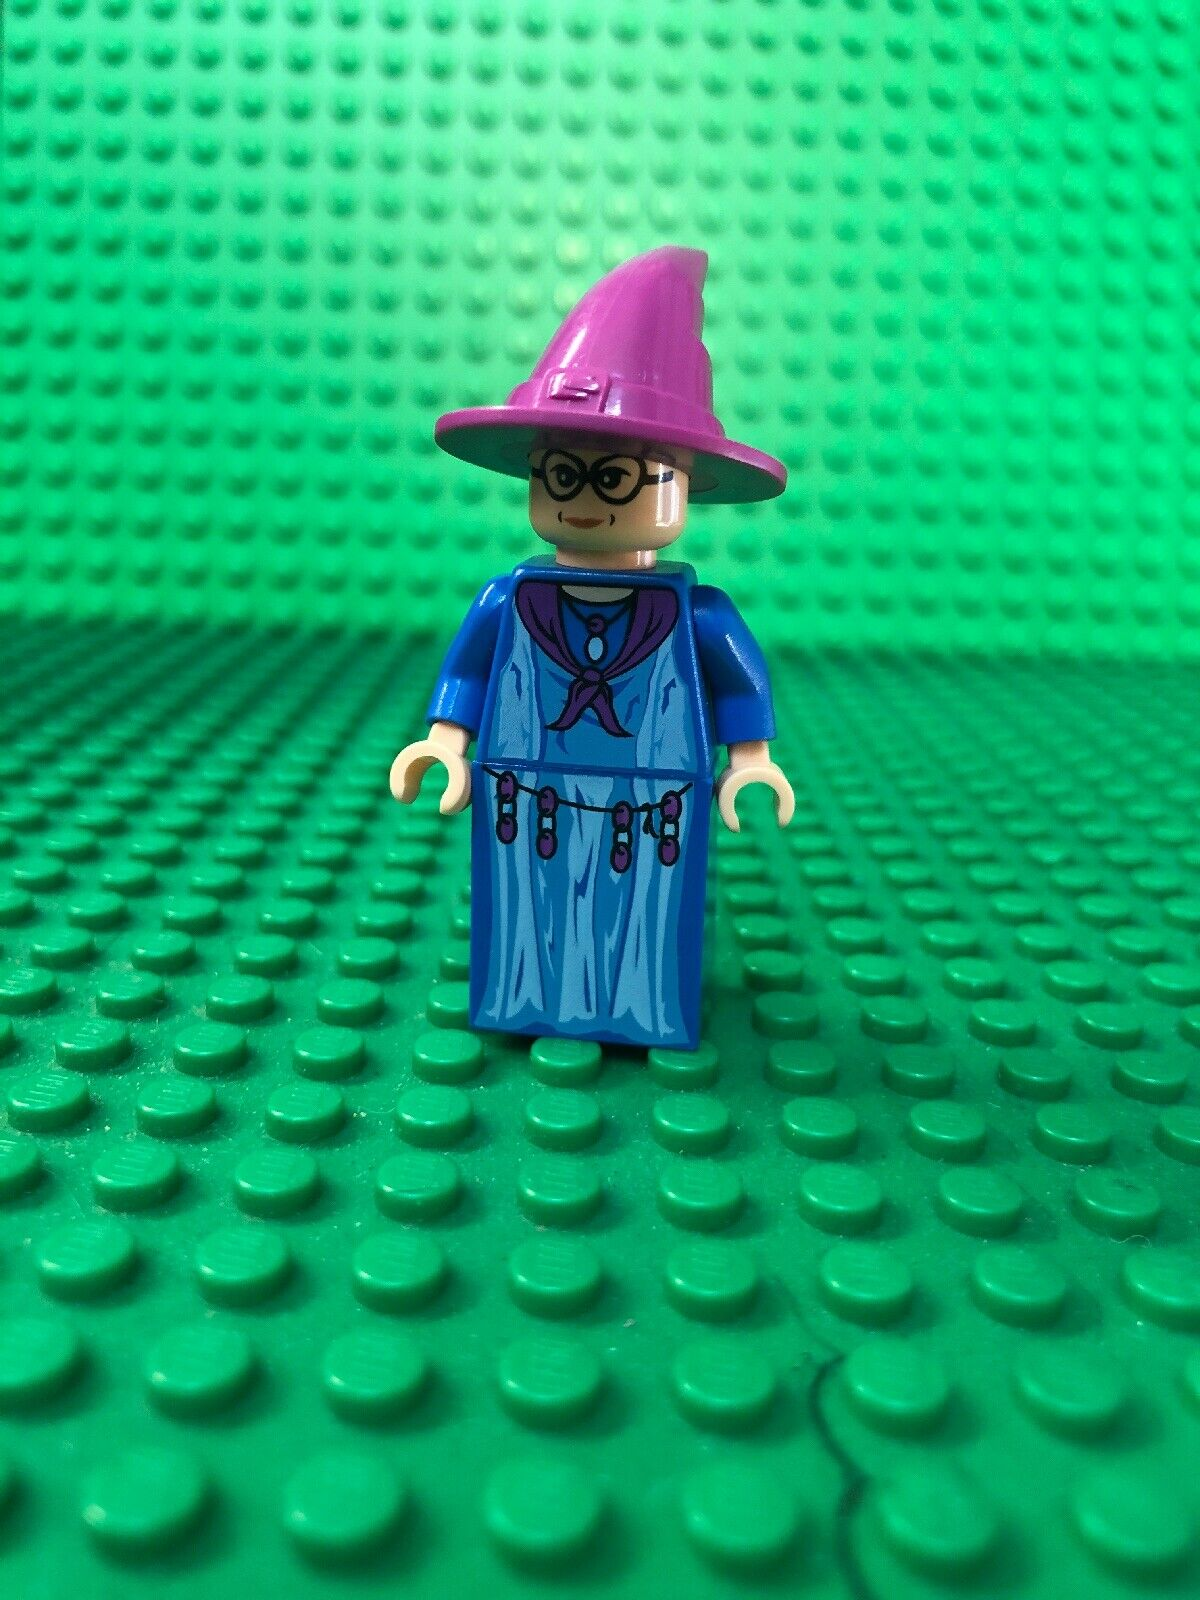 prezzi eccellenti LEGO HARRY POTTER POTTER POTTER PROFESSOR TRELAWNEY viola HAT blu ROBE MINIcifra 4757  qualità di prima classe